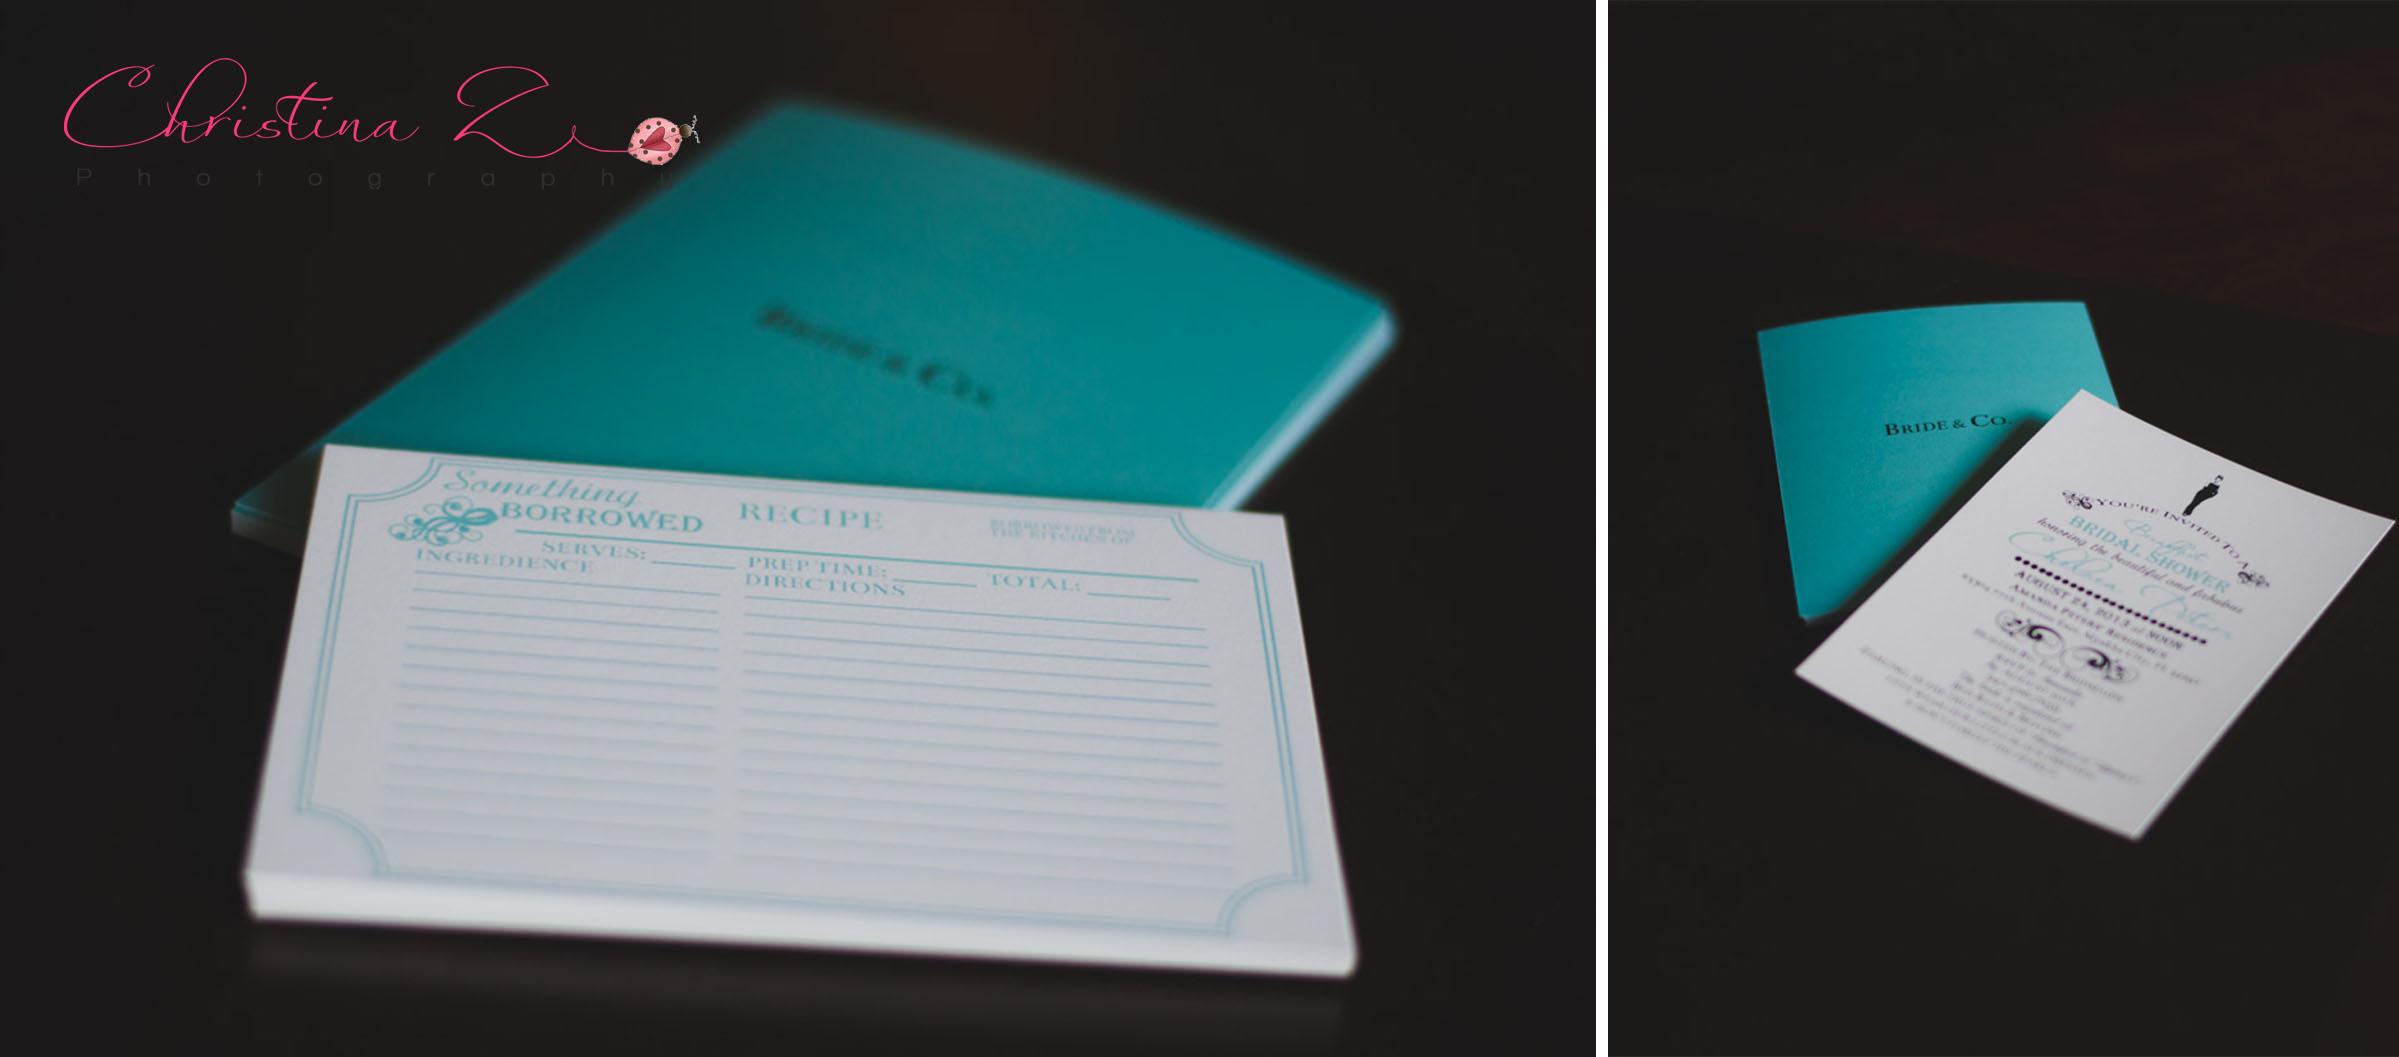 Breakfast at Tiffany's Bridal Shower | Bradenton FL Photographer | Engagement & Wedding Photographer | © Christina Z Photography